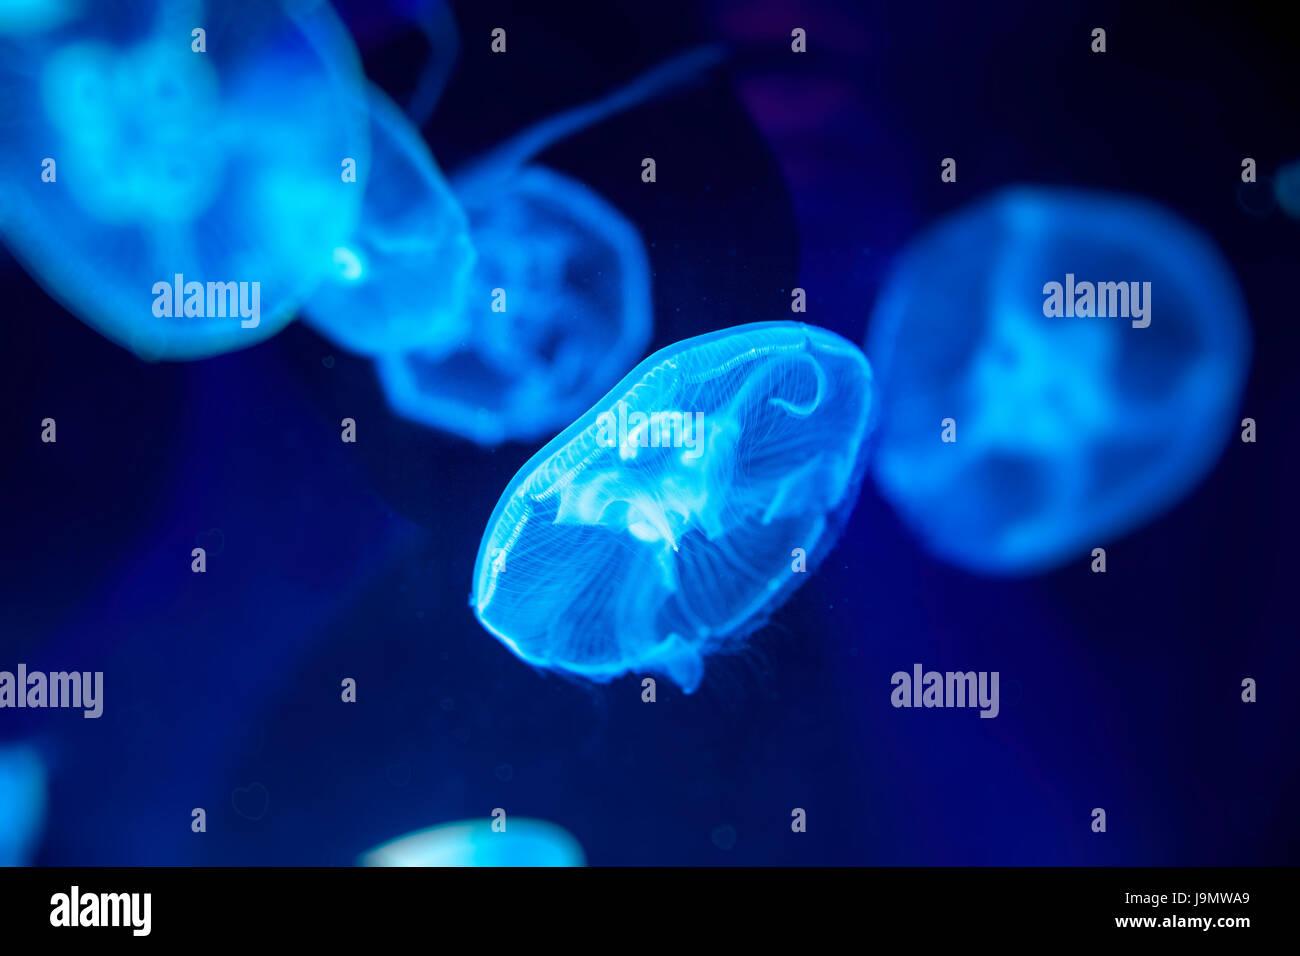 Moon jelly fish (Aurelia aurita) in London SEALIFE aquarium, UK. - Stock Image